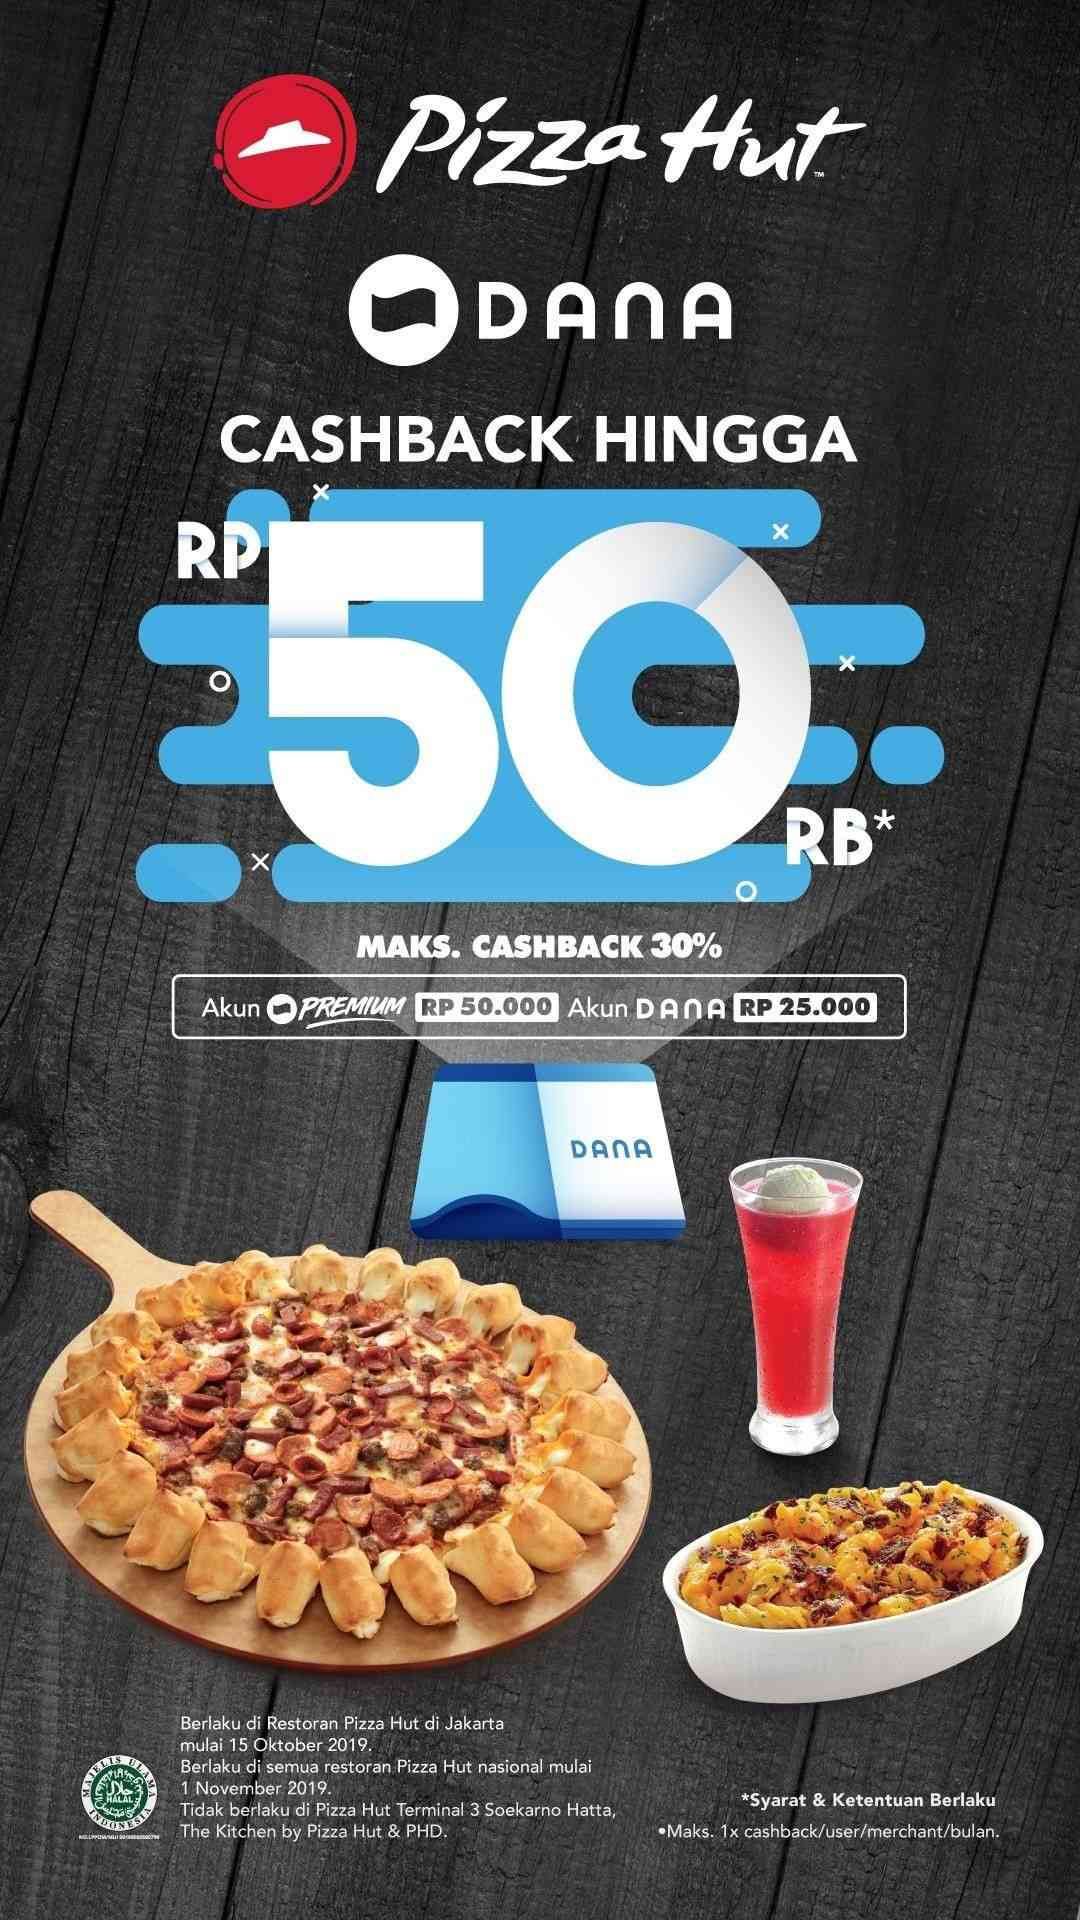 Pizza Hut Promo Cashback 30% dengan DANA